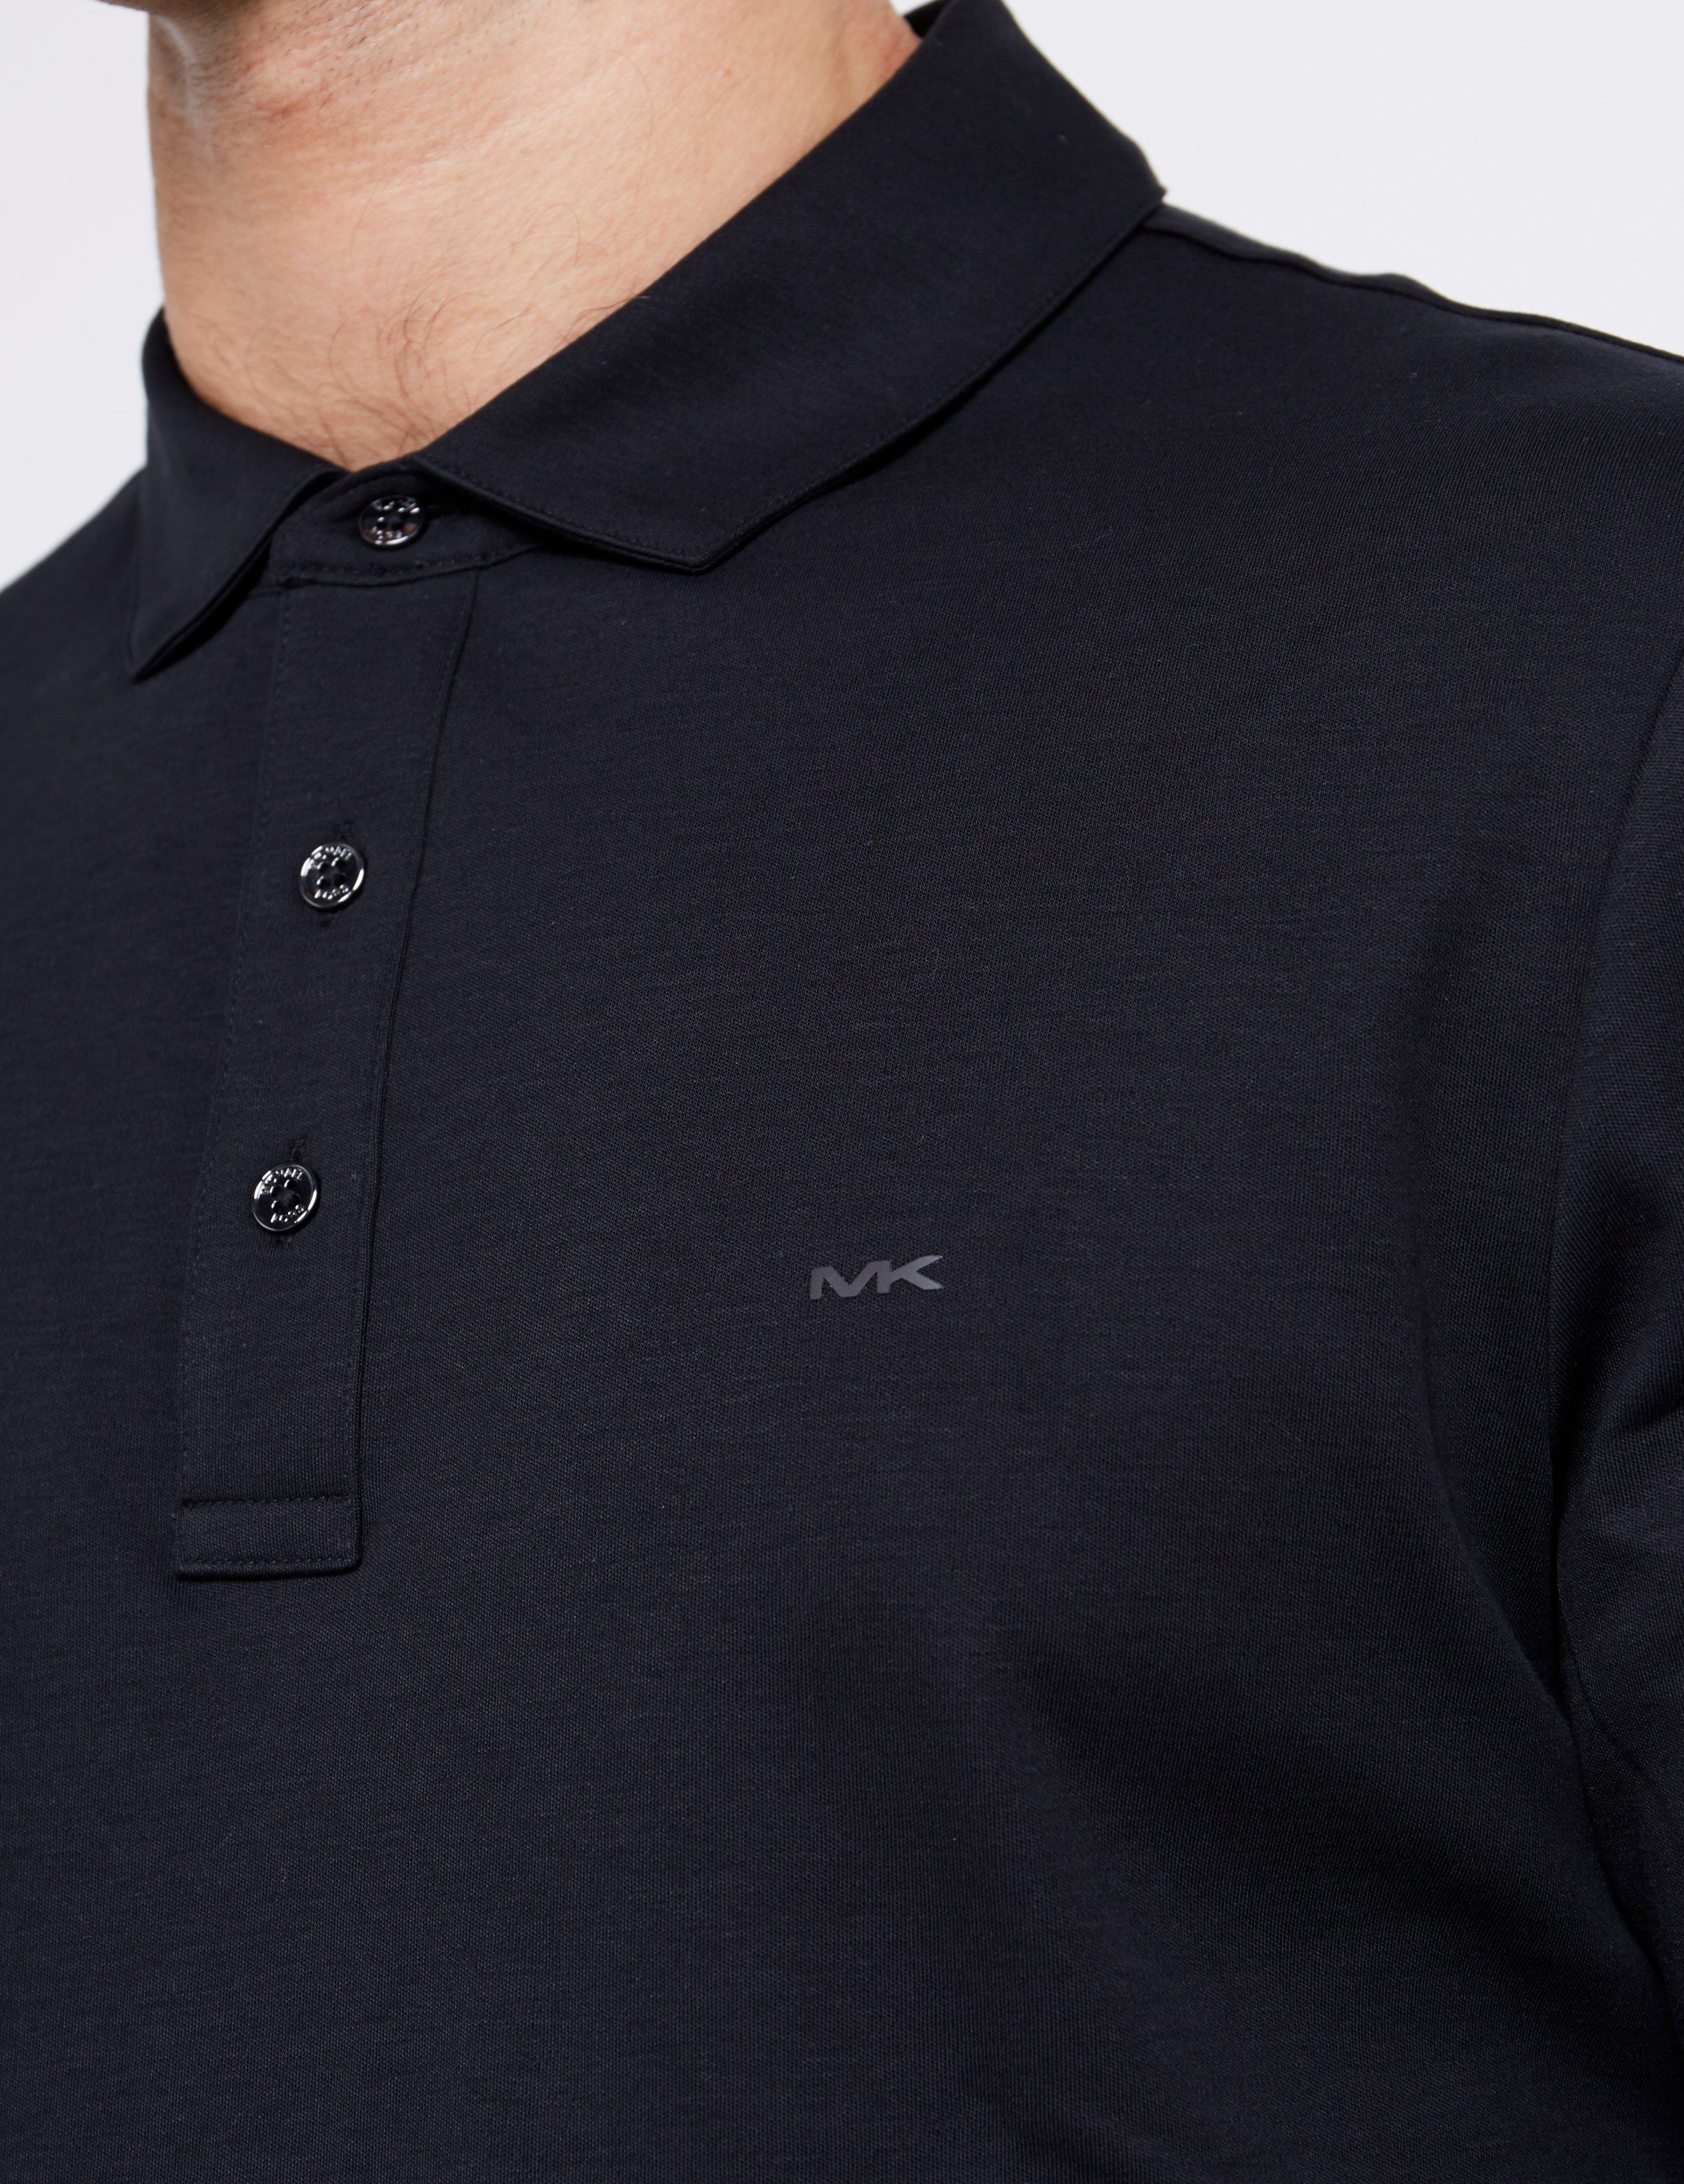 e6c26b86 Michael Kors - Sleek Long Sleeve Polo Shirt Black for Men - Lyst. View  fullscreen